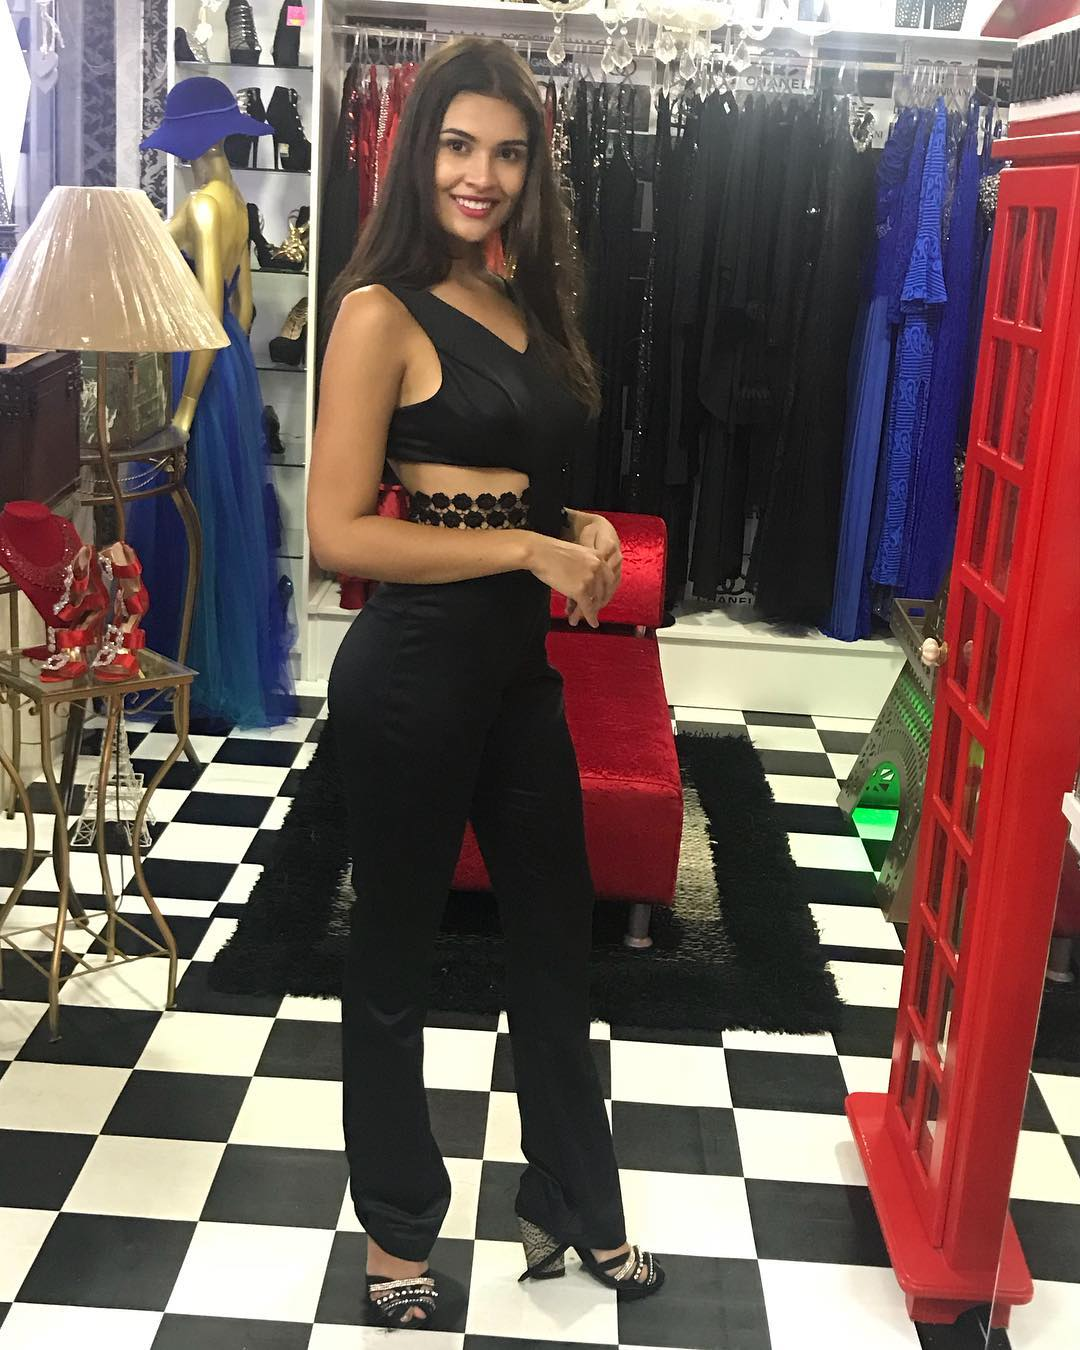 marcela moura, miss bahia mundo 2018. - Página 2 37863010